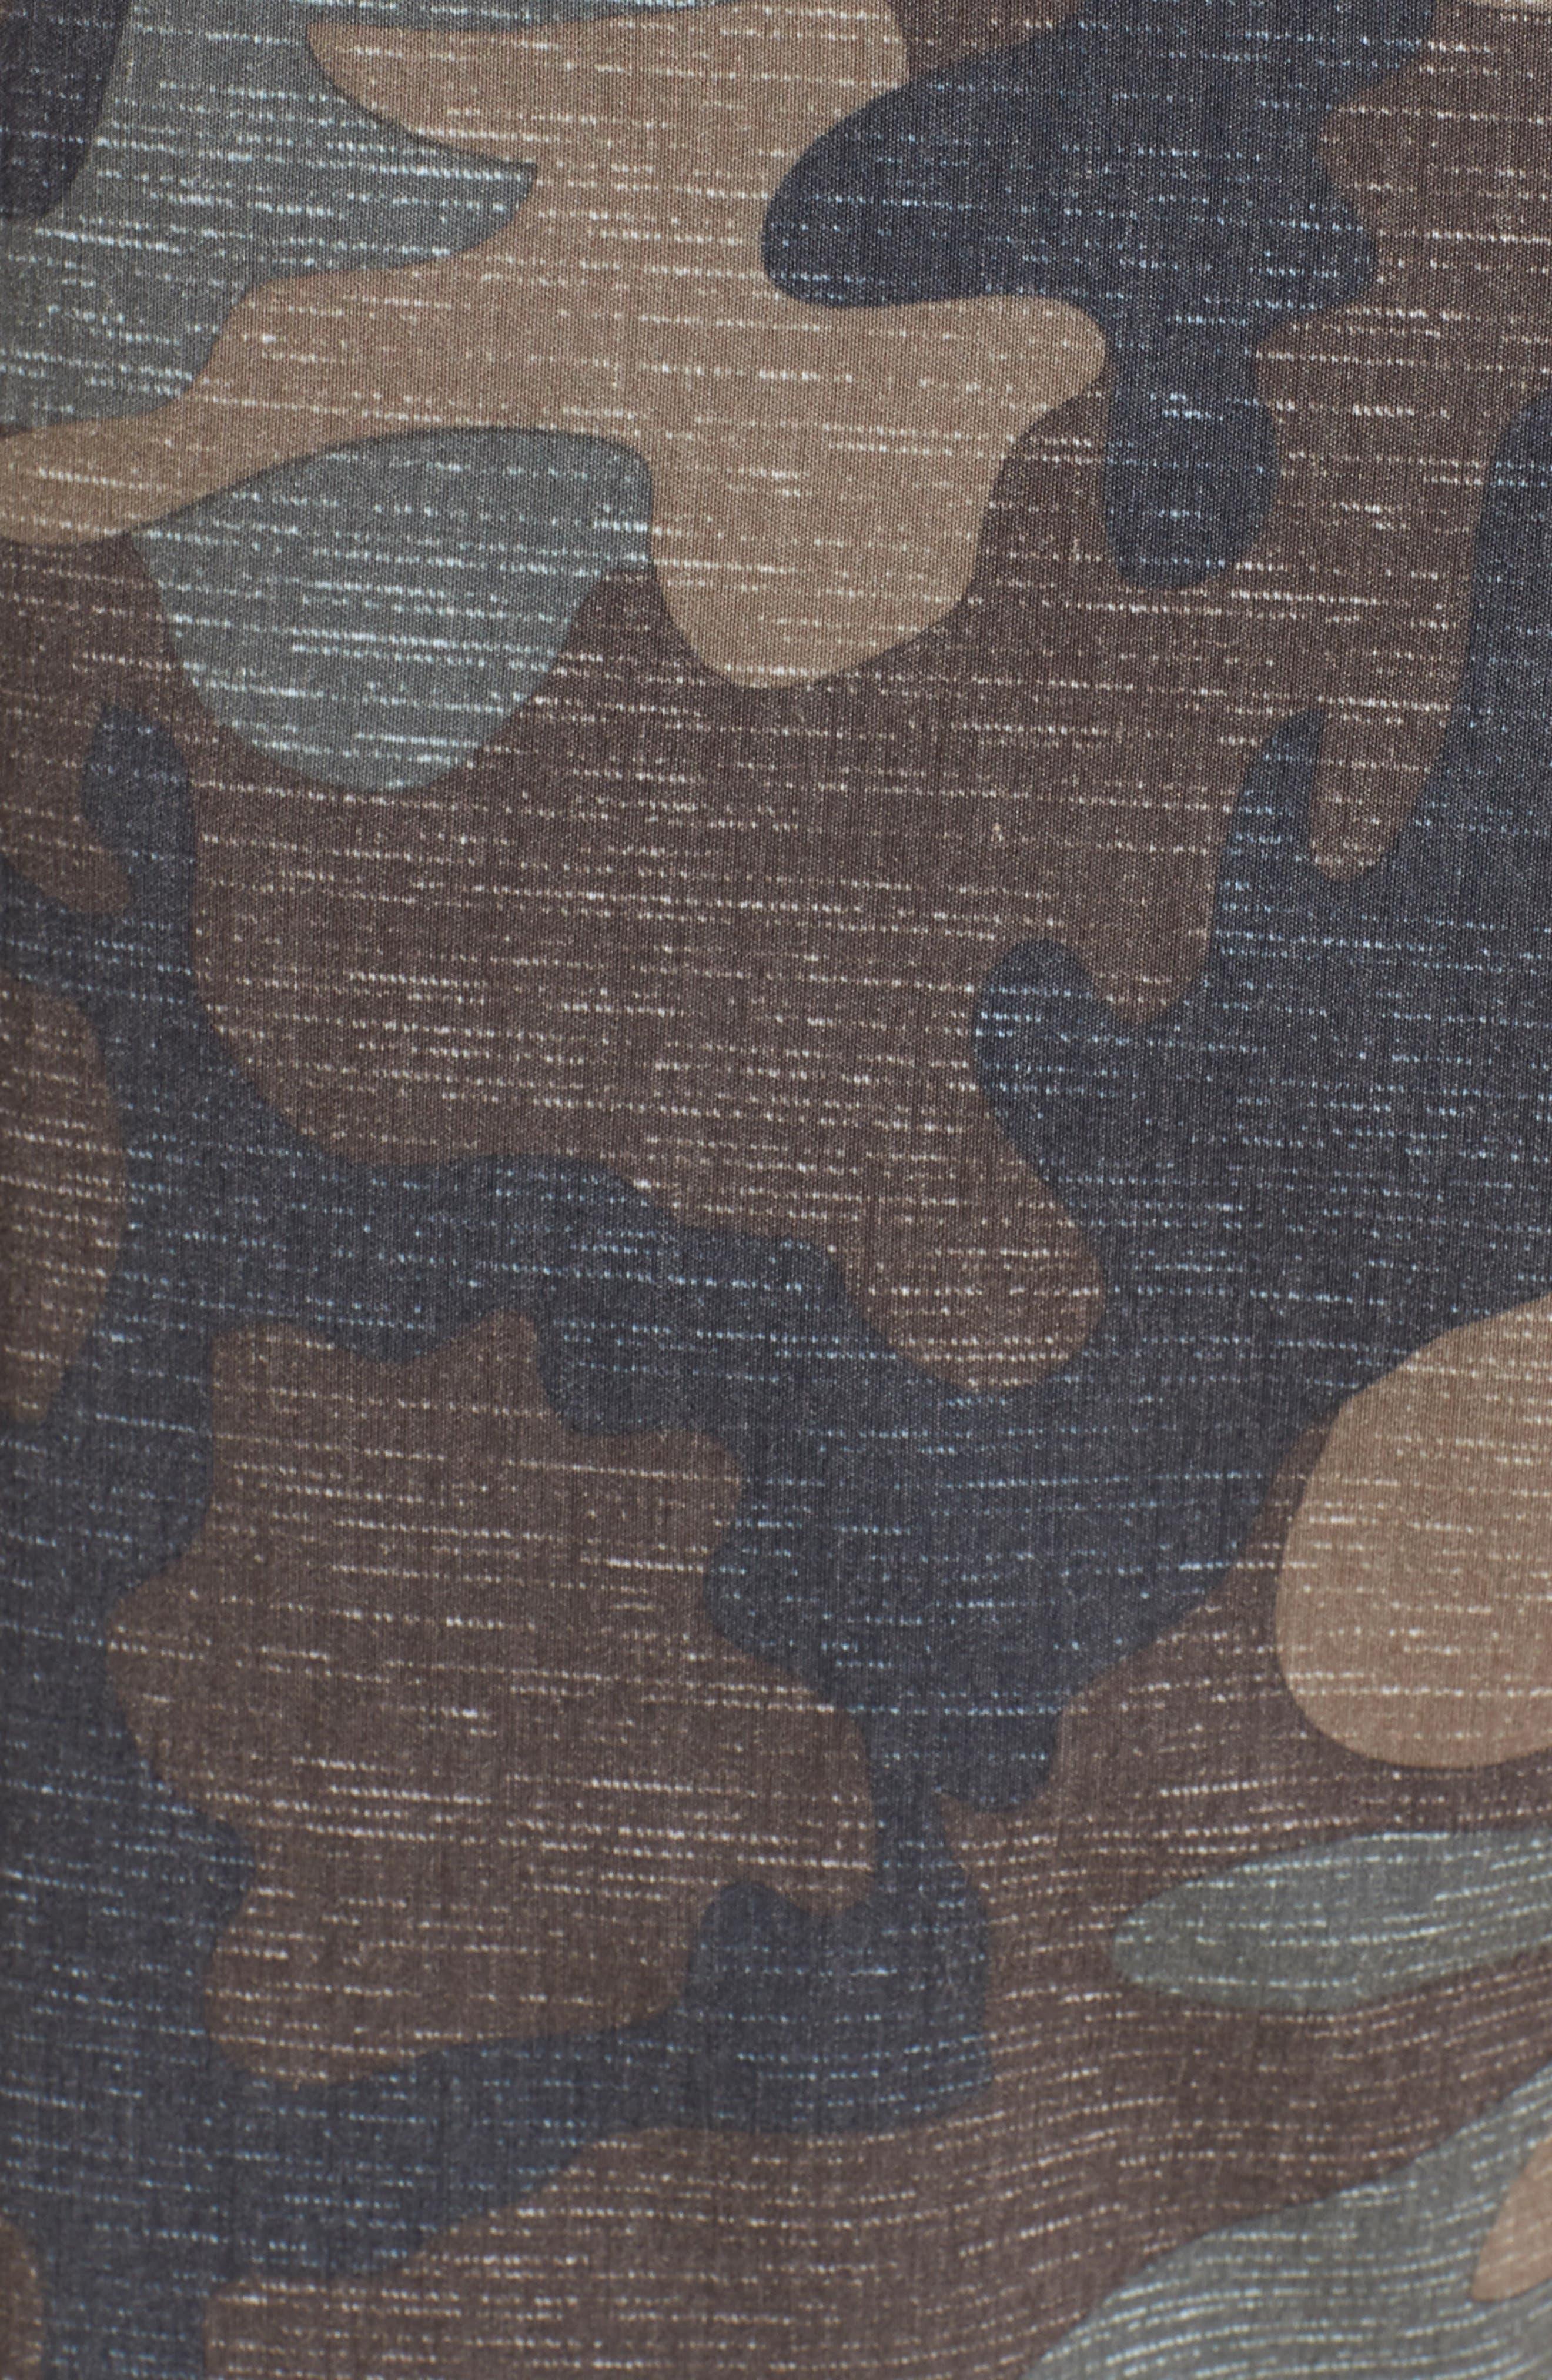 Mixed Hybrid Shorts,                             Alternate thumbnail 5, color,                             Camo